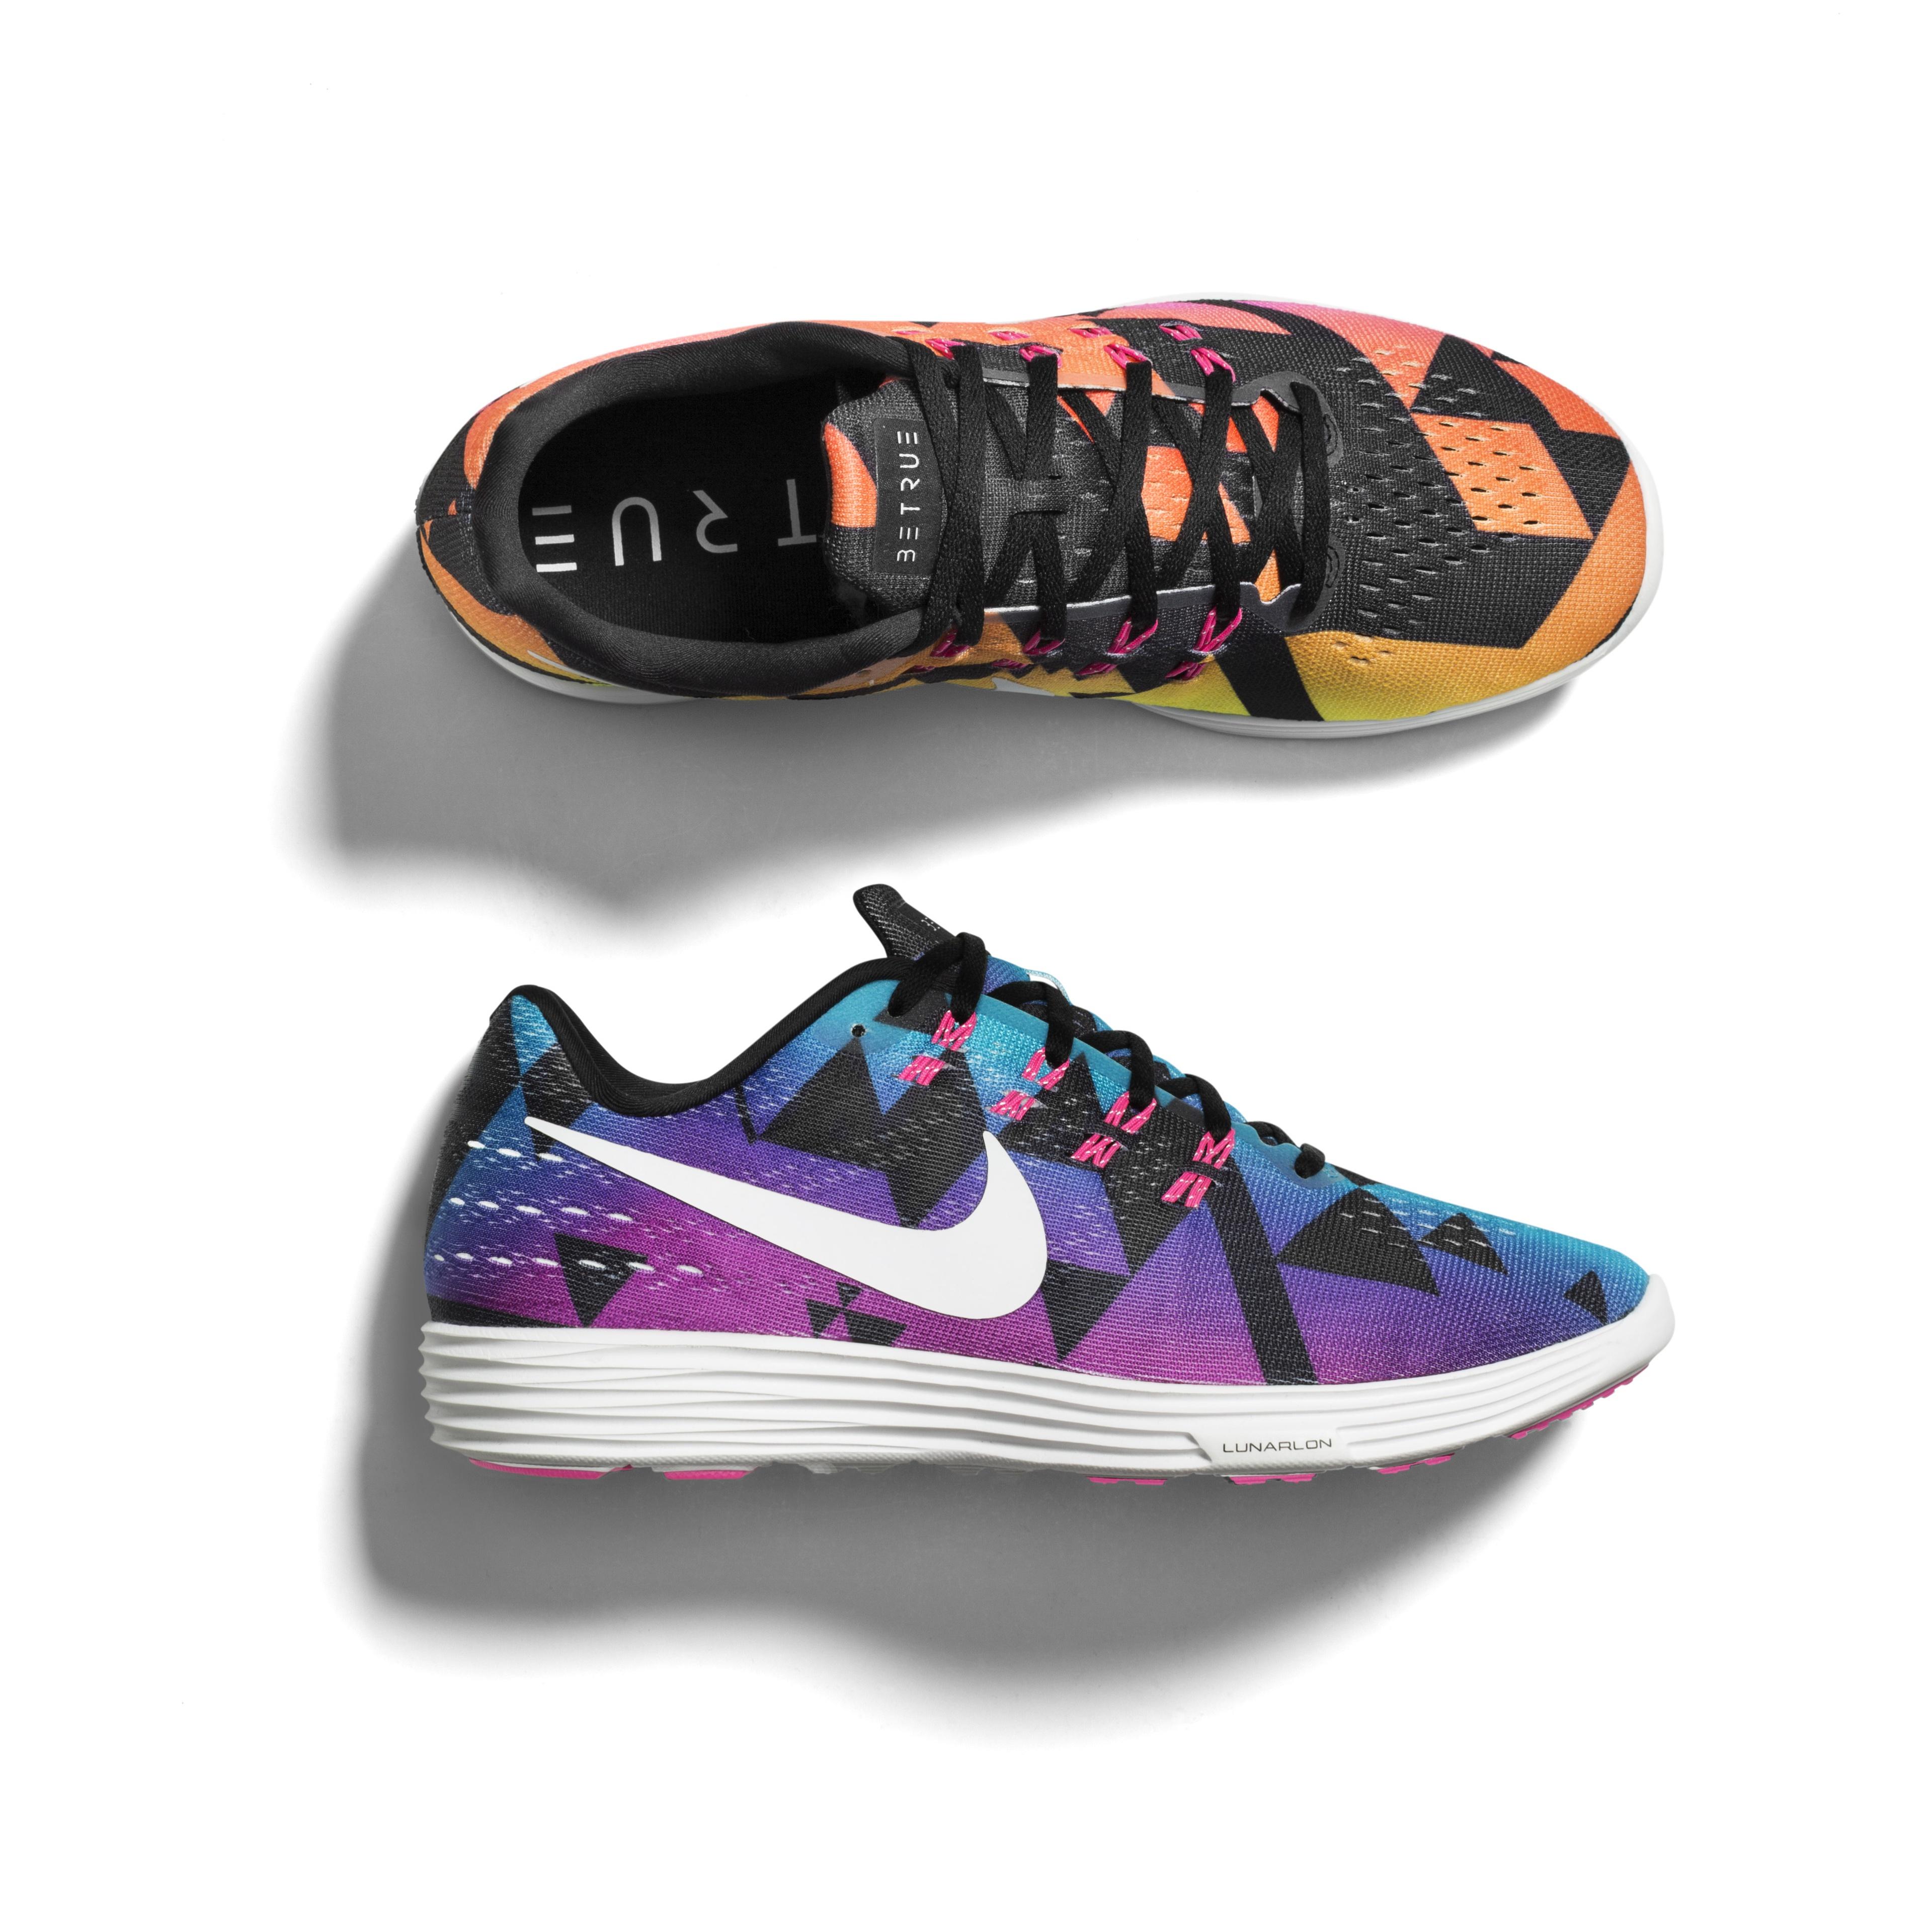 c20cbf25cd7e The spirited sneaker designs inspired by LGBT pride month — Quartz